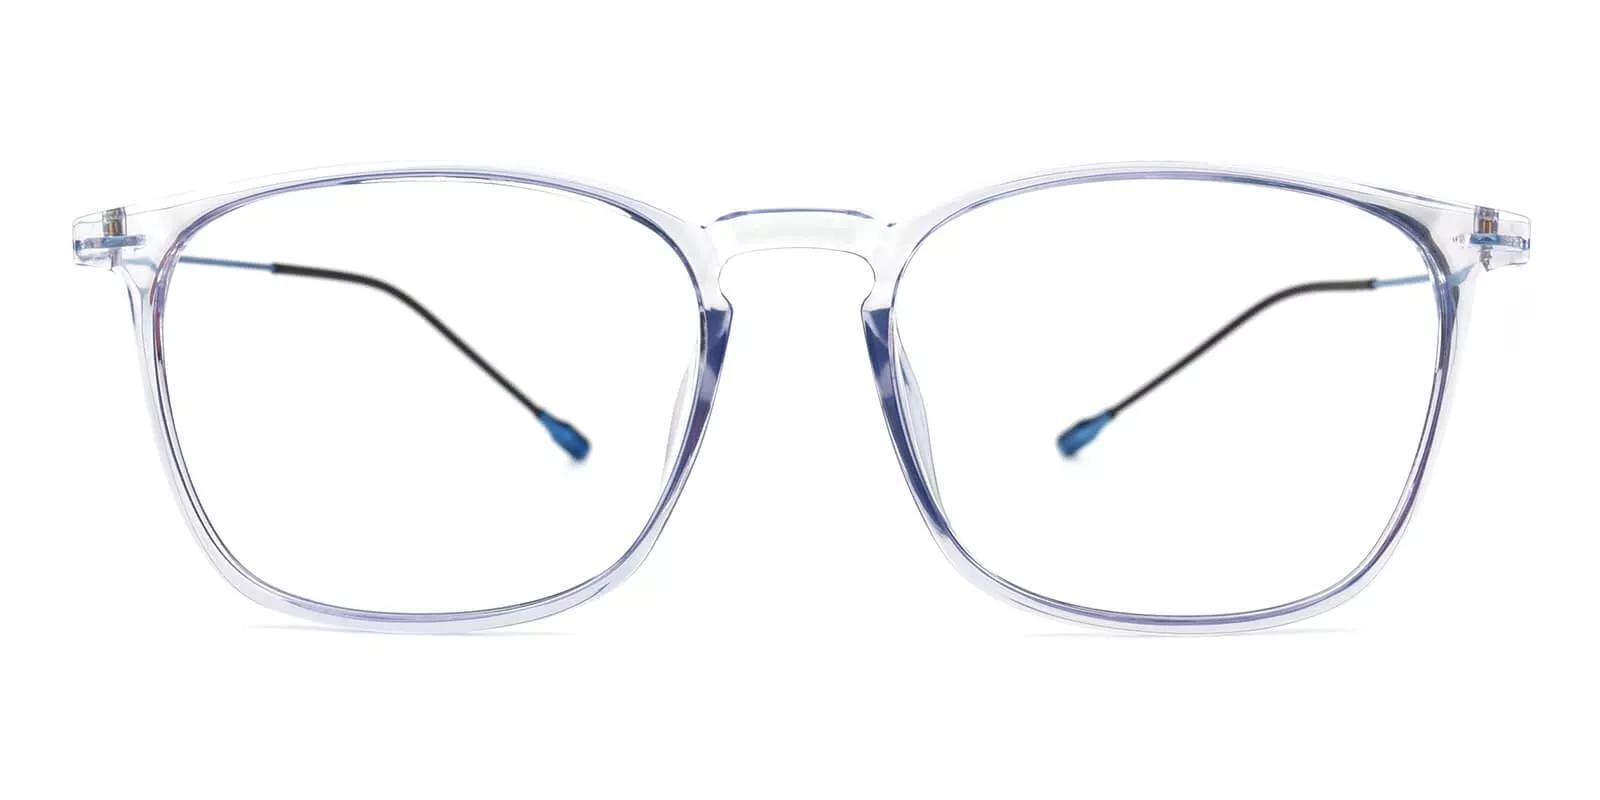 Norwalk Prescription Eyeglasses Blue Clear